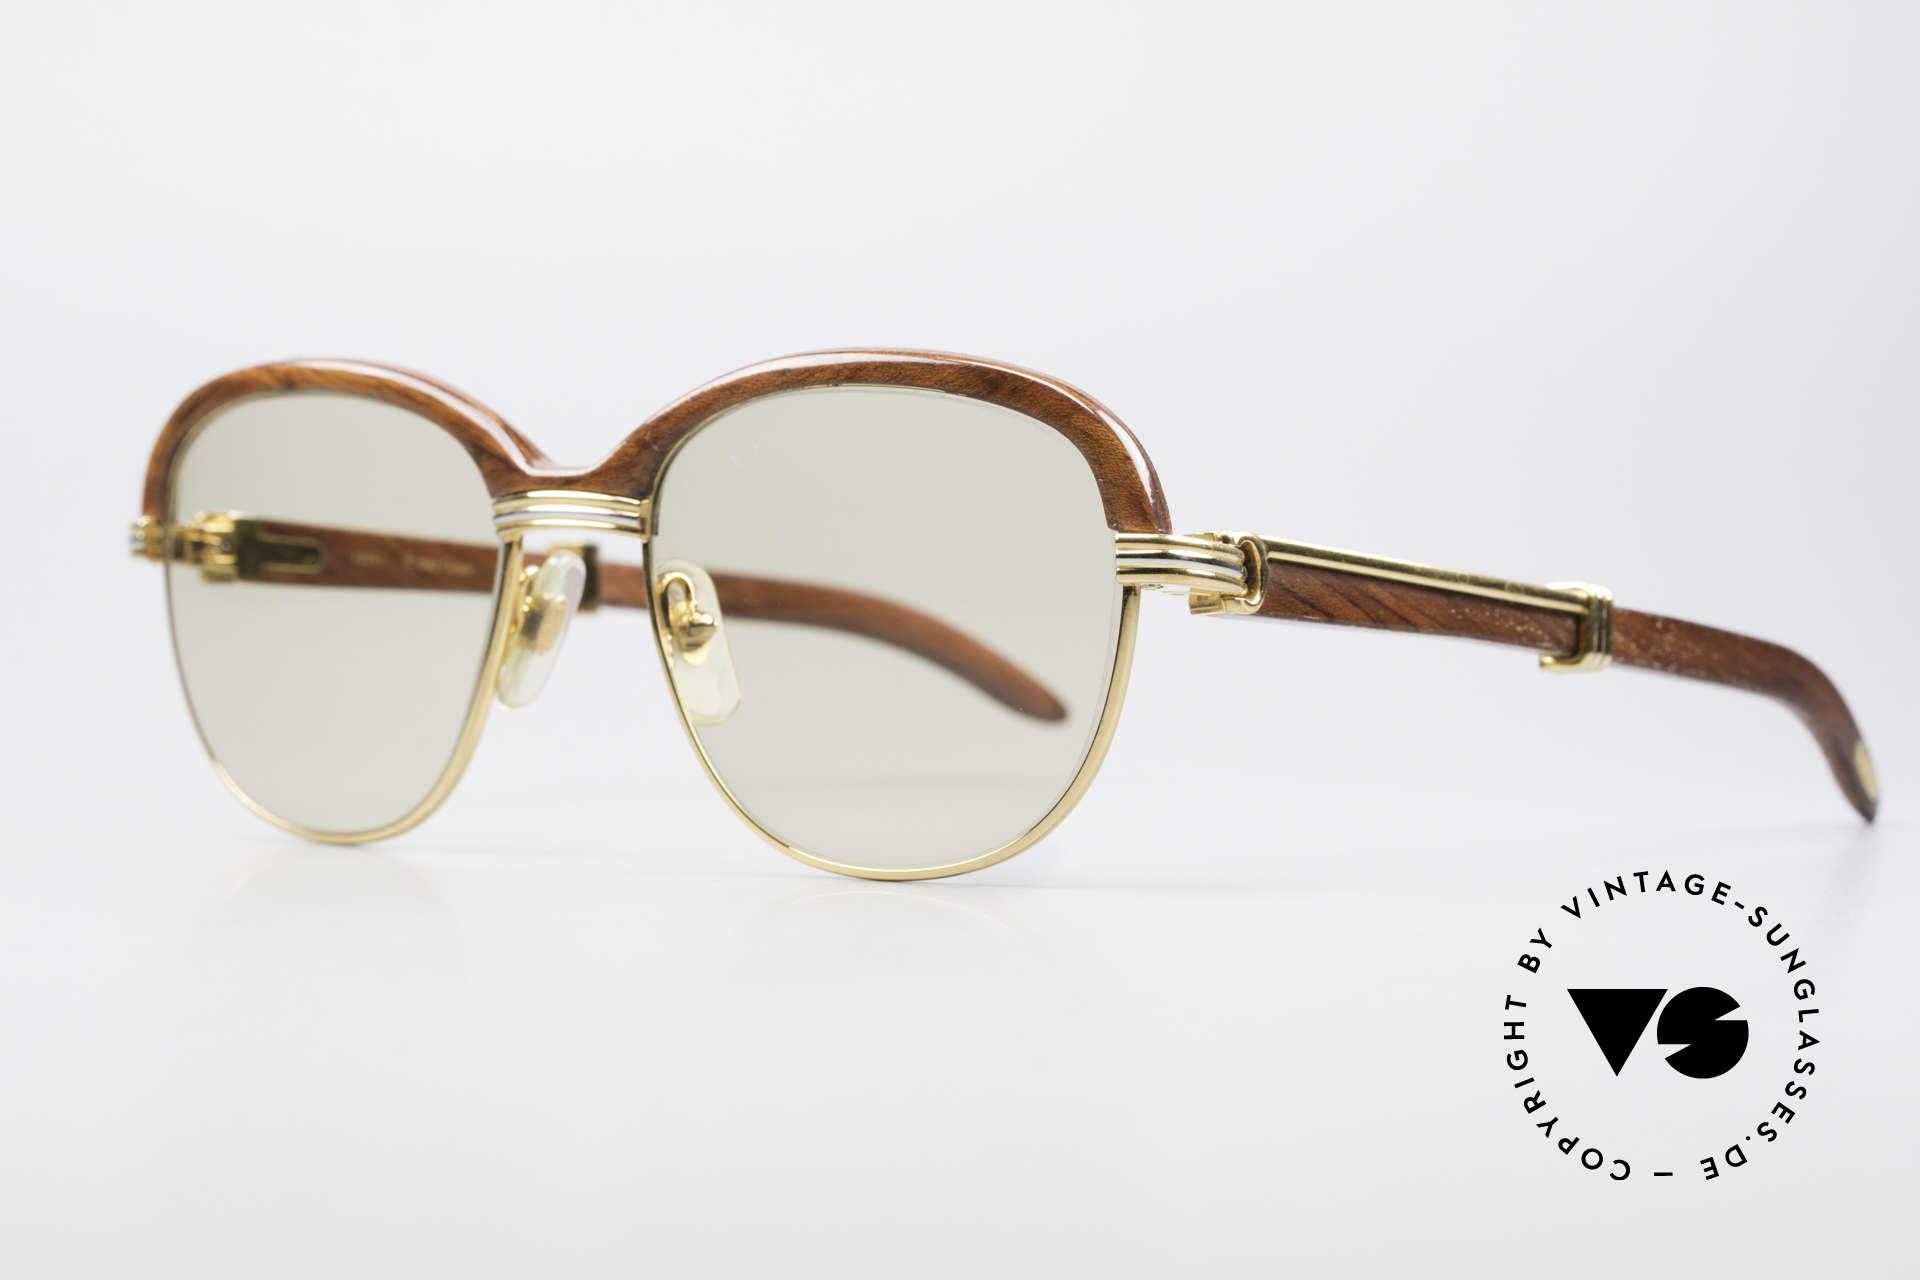 2d399872a3b3 Sunglasses cartier malmaison floyd mayweather sunglasses vintage jpg  1920x1280 Malmaison cartier